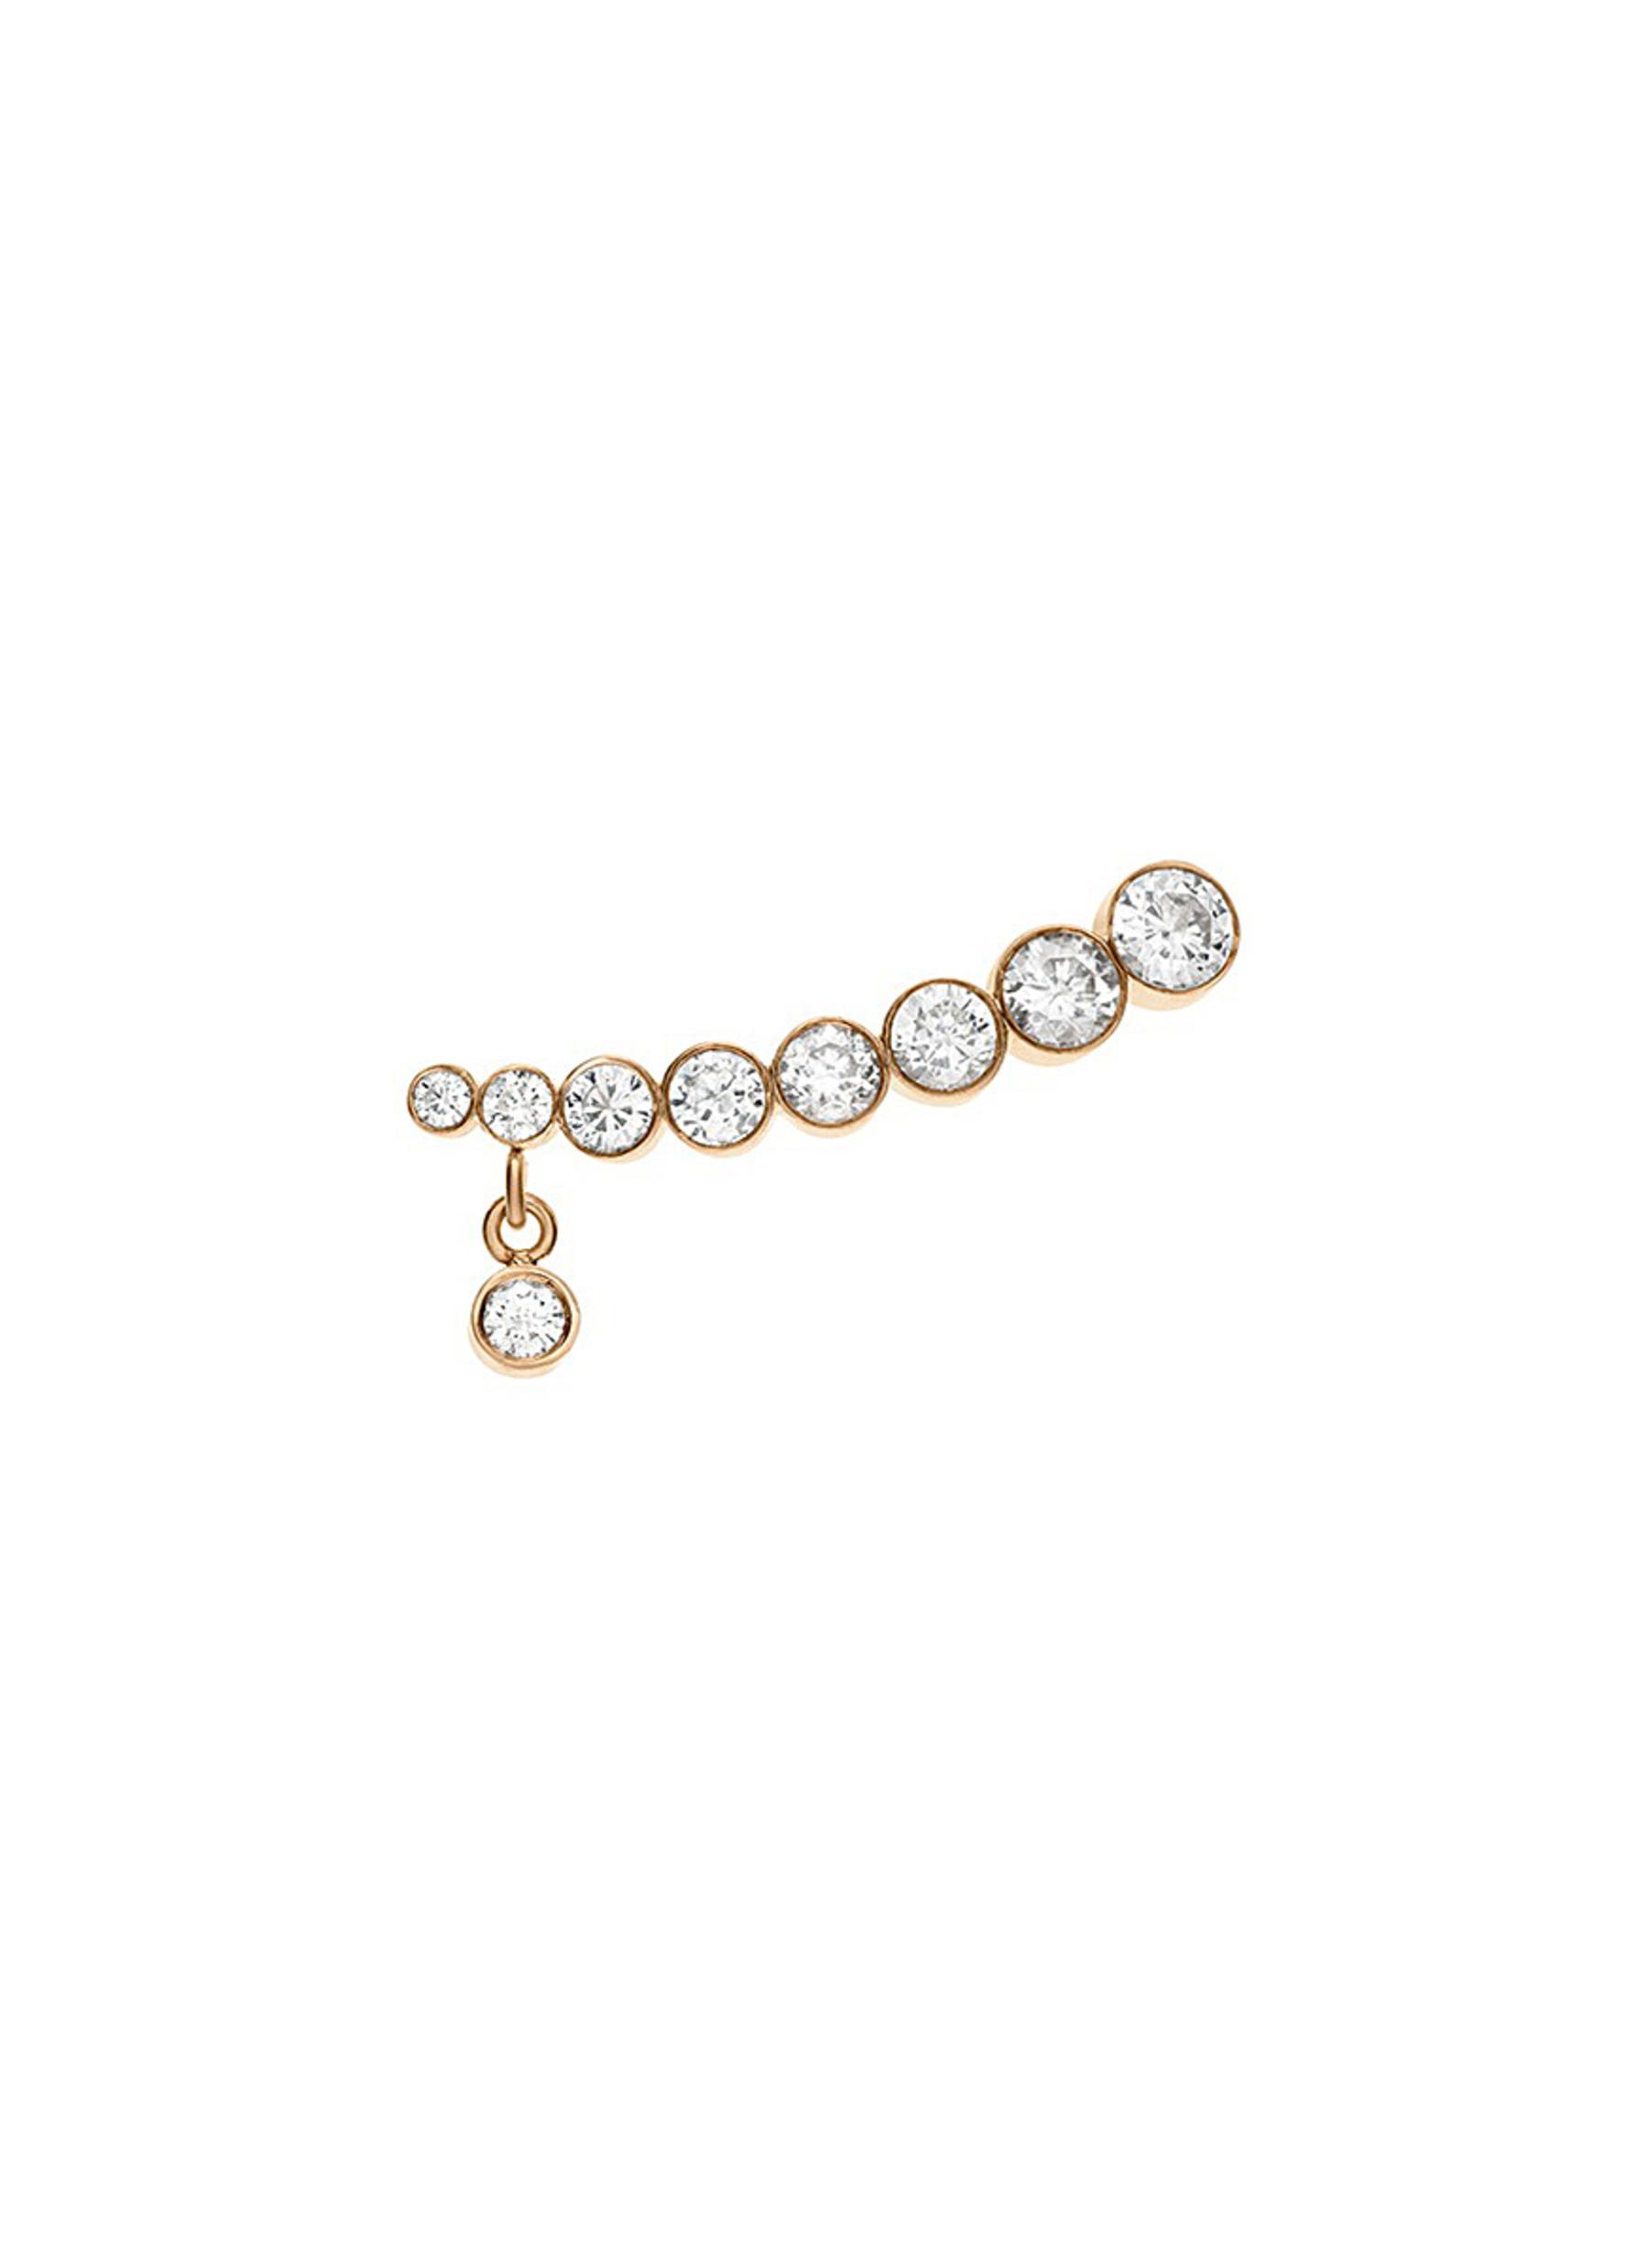 Croissant Amanda diamond 18k yellow gold single earring by Sophie Bille Brahe